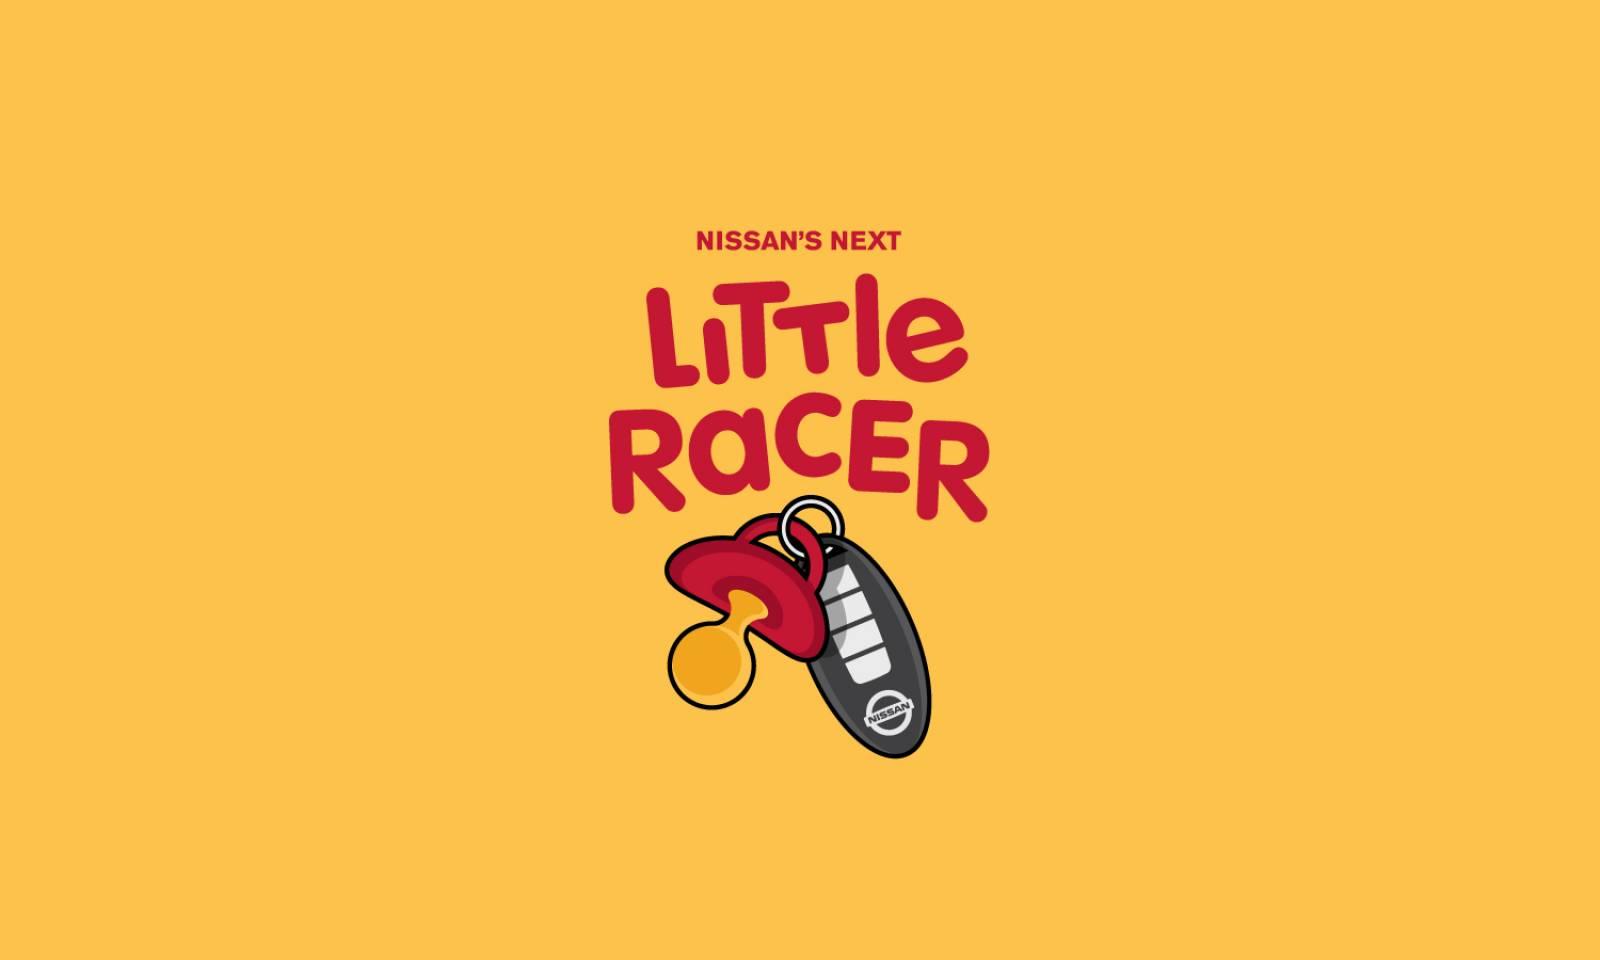 logo-Nissan-little-race-logo-corporate-identity-agency-graphic-design-canterbury.jpg